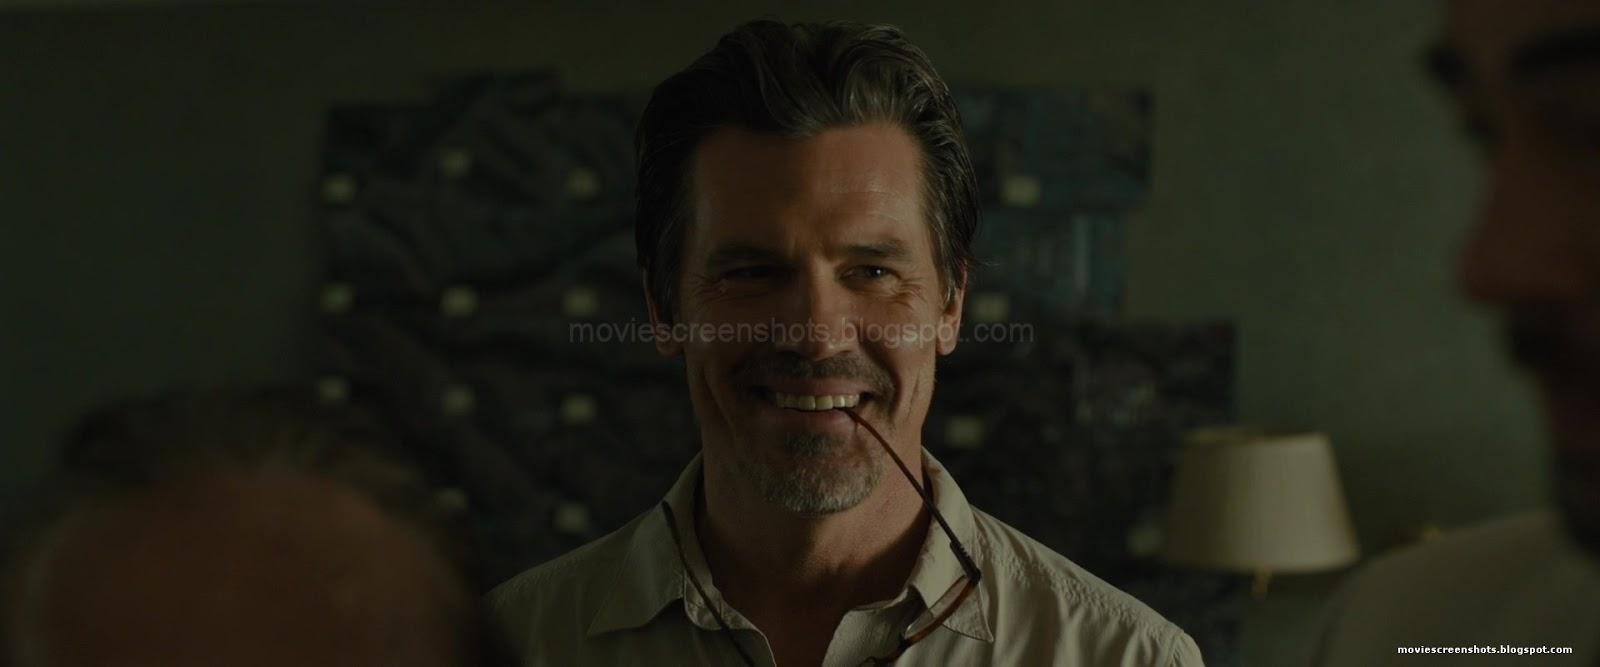 Vagebond's Movie ScreenShots: Sicario (2015) part 2